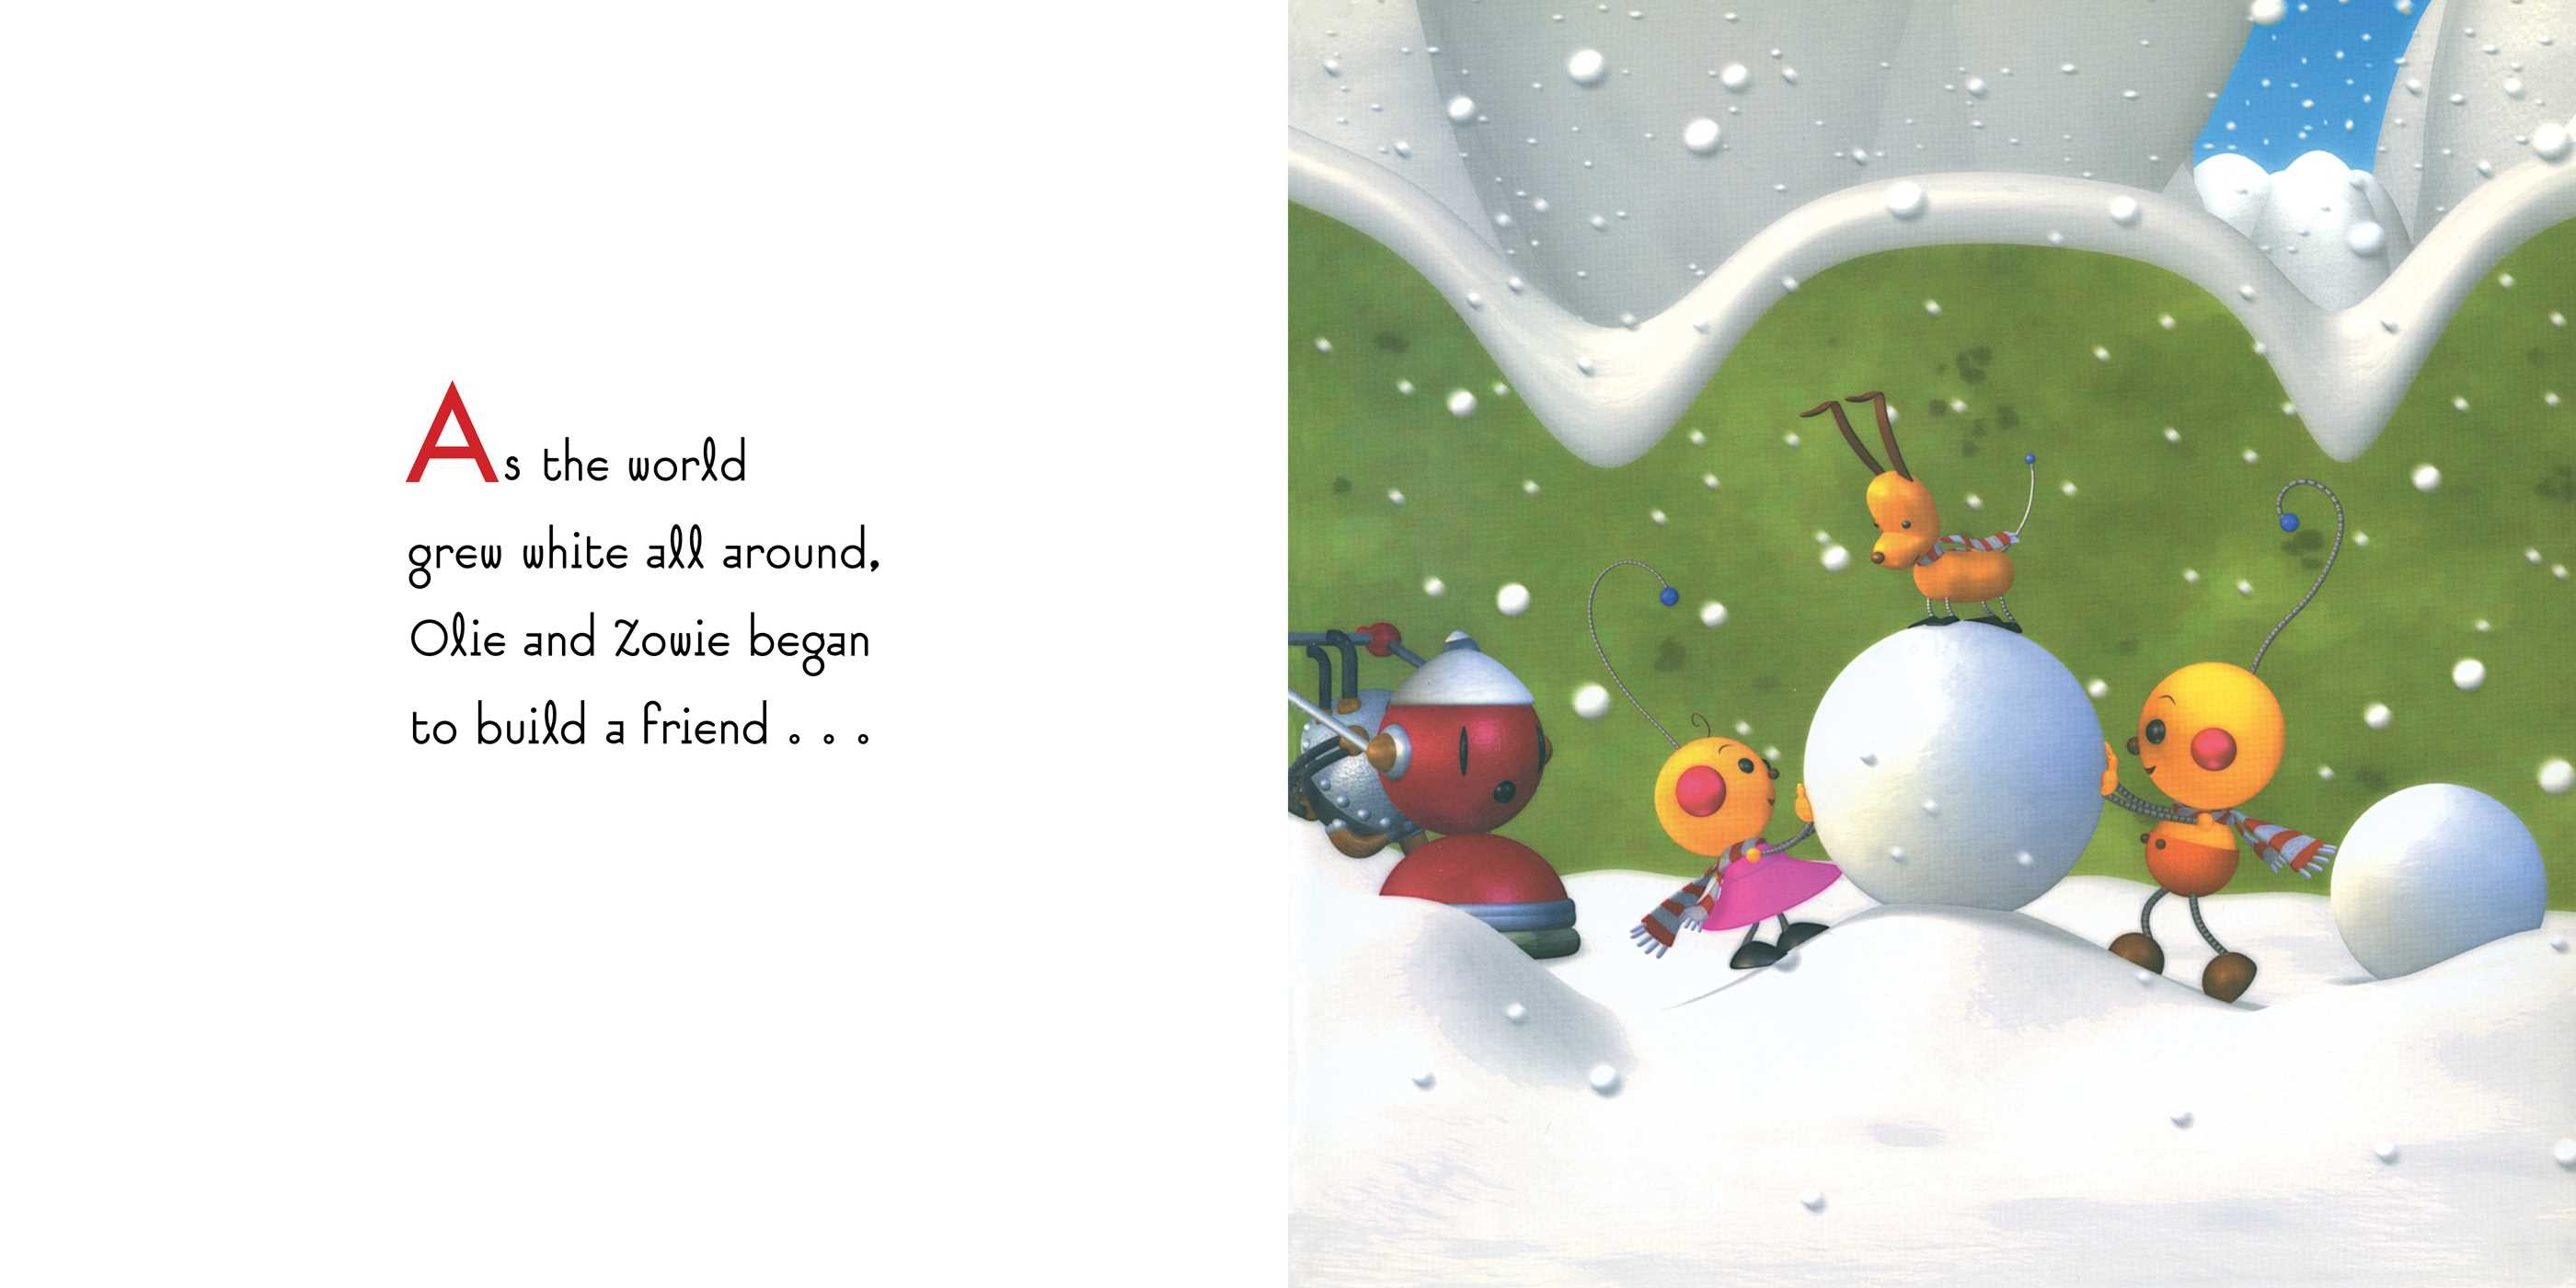 Snowie rolie 9781481489676.in01